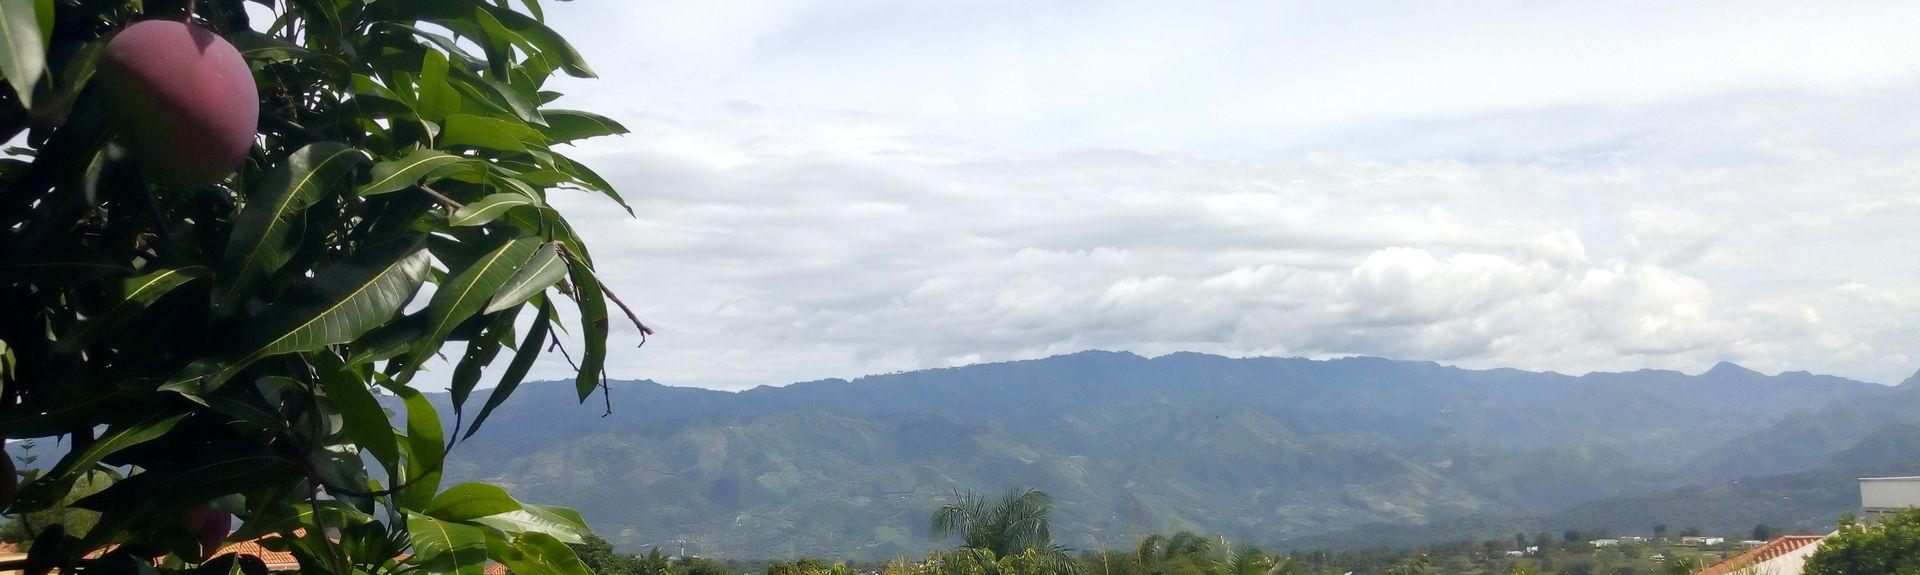 Anapoima, Cundinamarca, Colombia